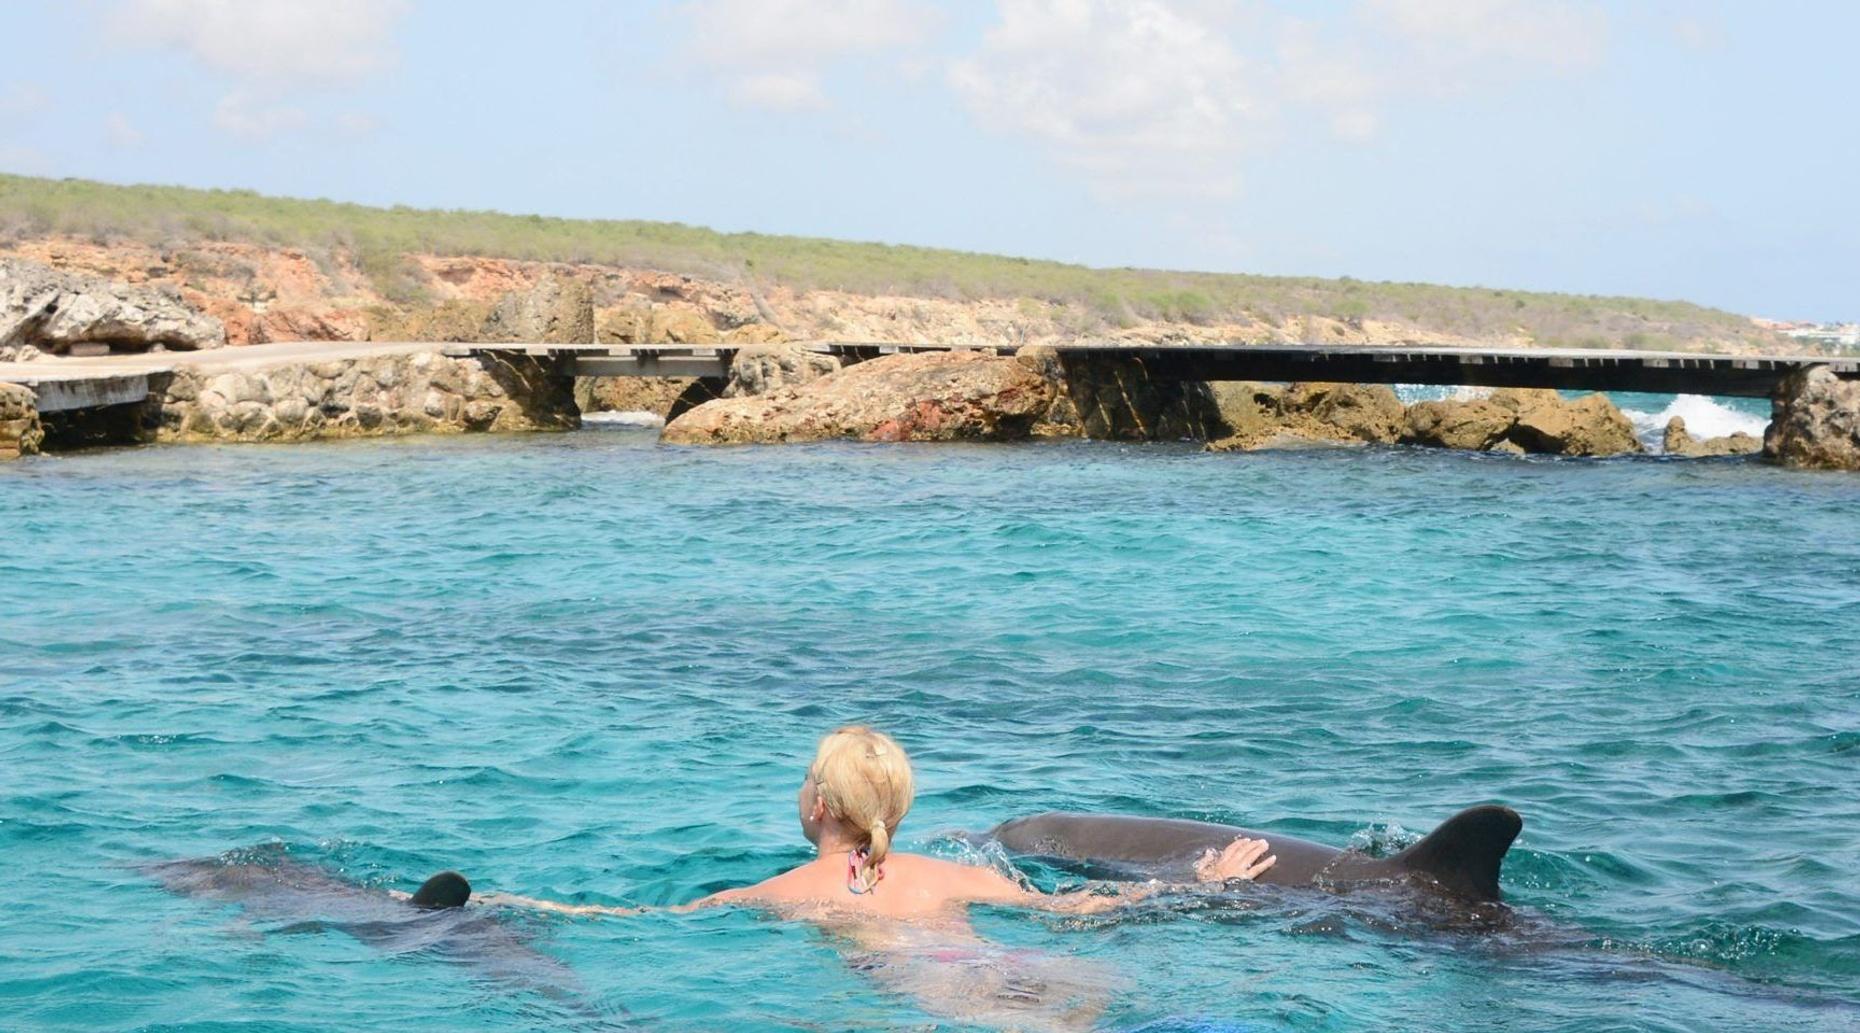 Swim With Dolphins in Bapor Kibrá, Curaçao